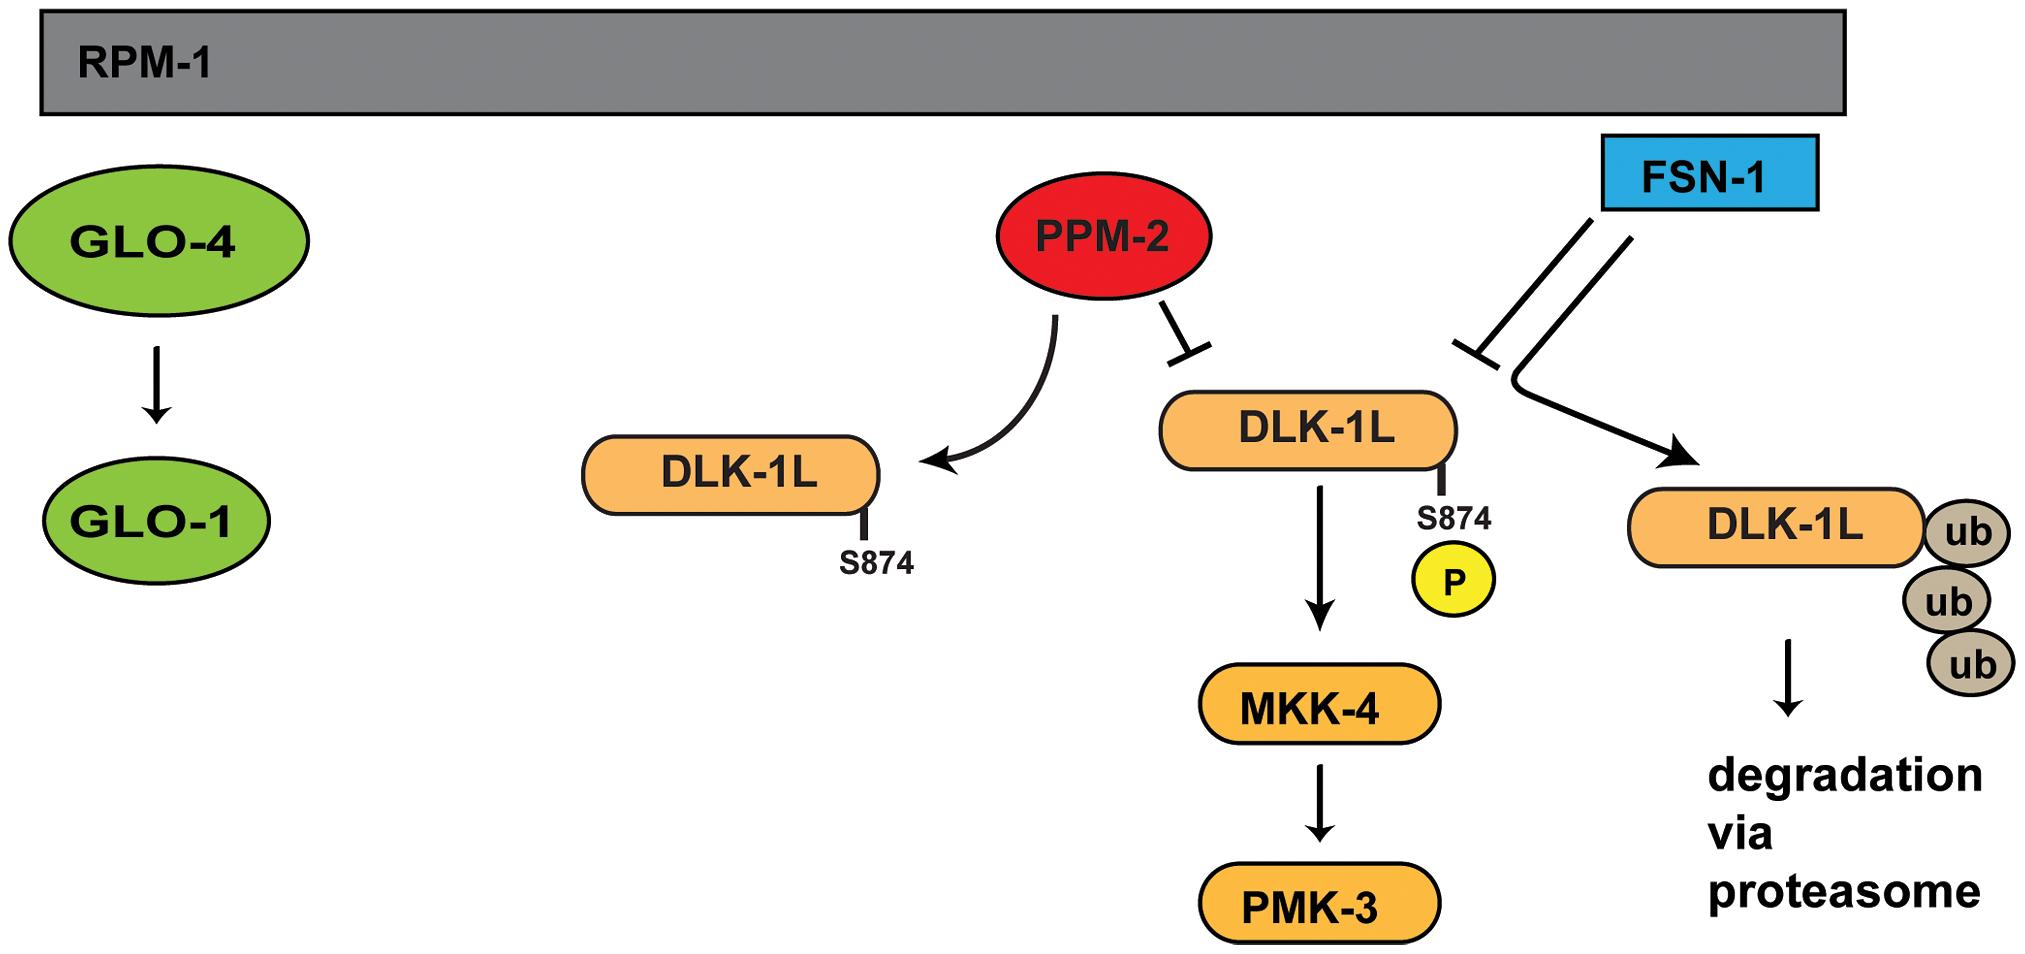 Summary of RPM-1 signaling.